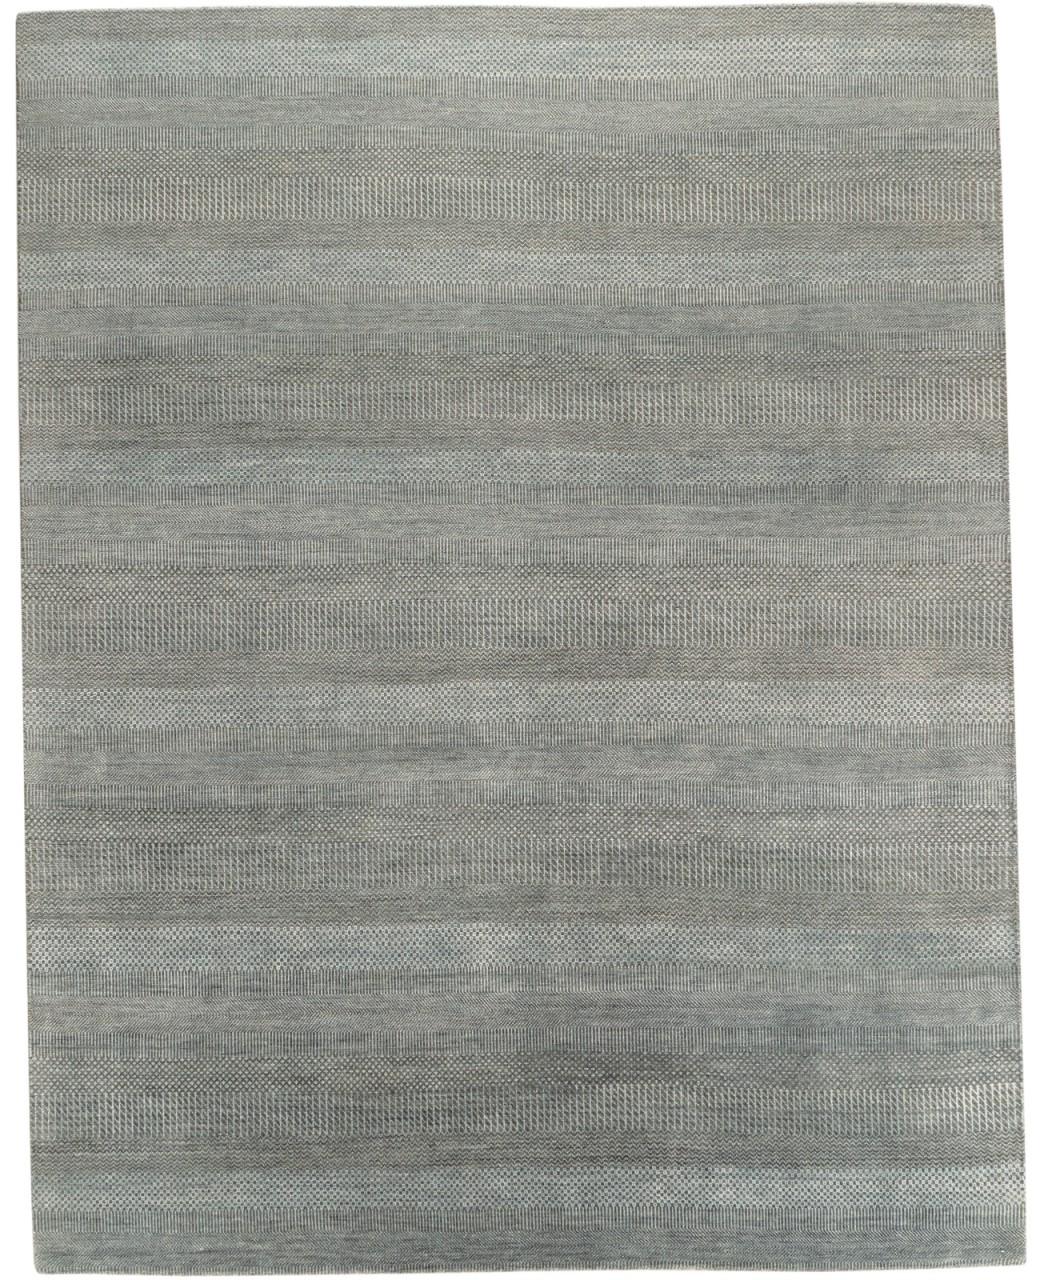 Design-Teppich Darya